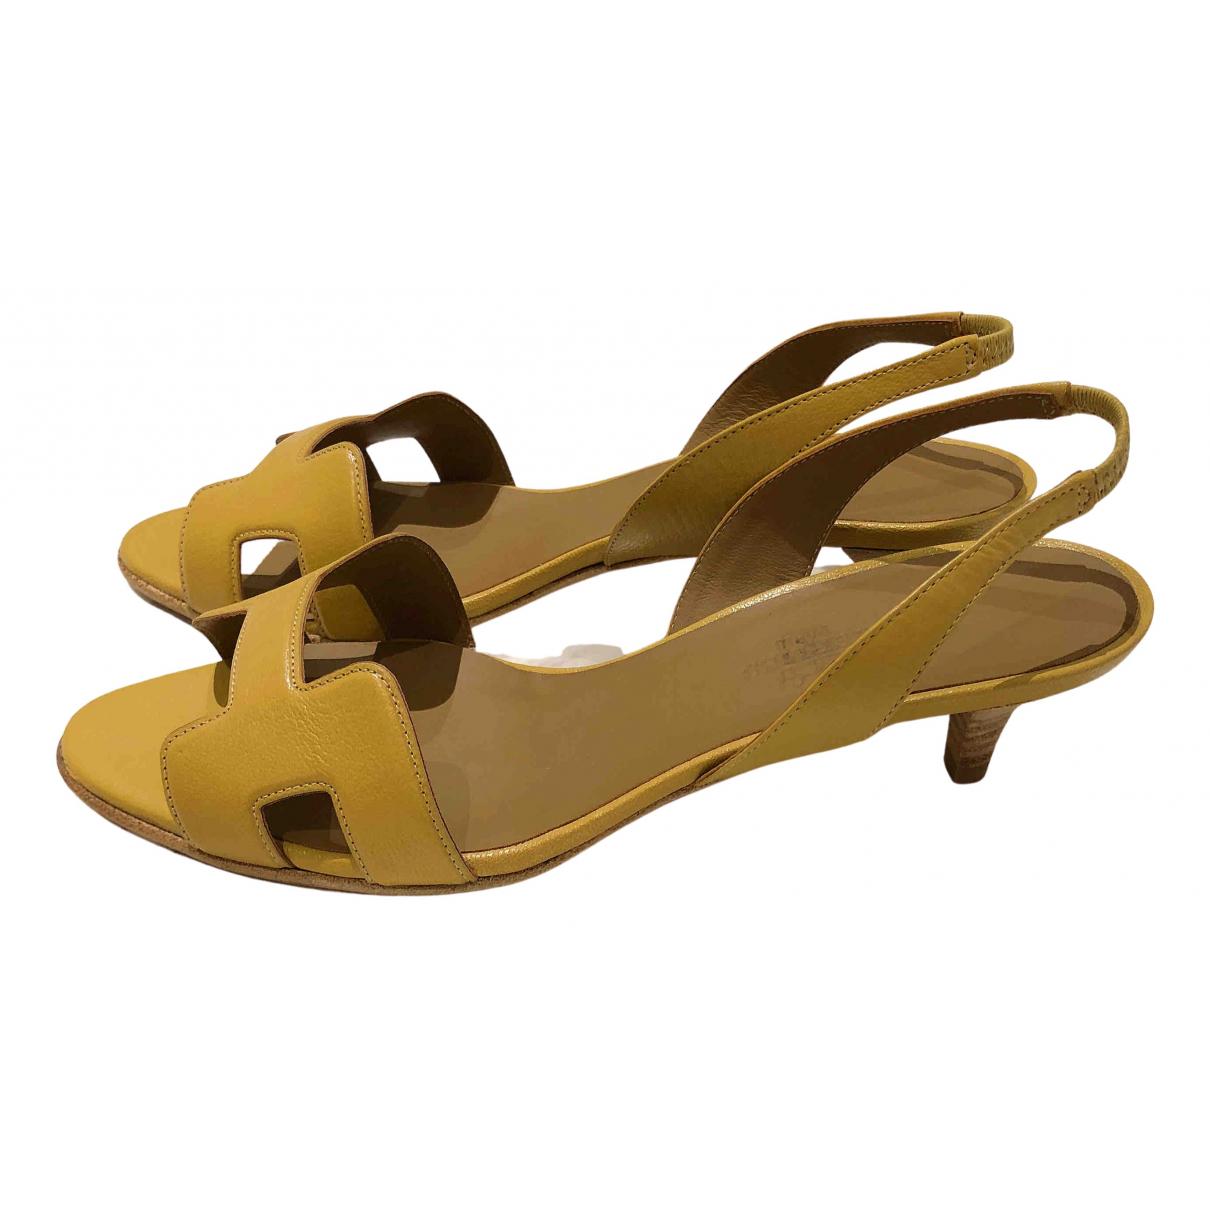 Hermès Night Yellow Leather Sandals for Women 37.5 EU